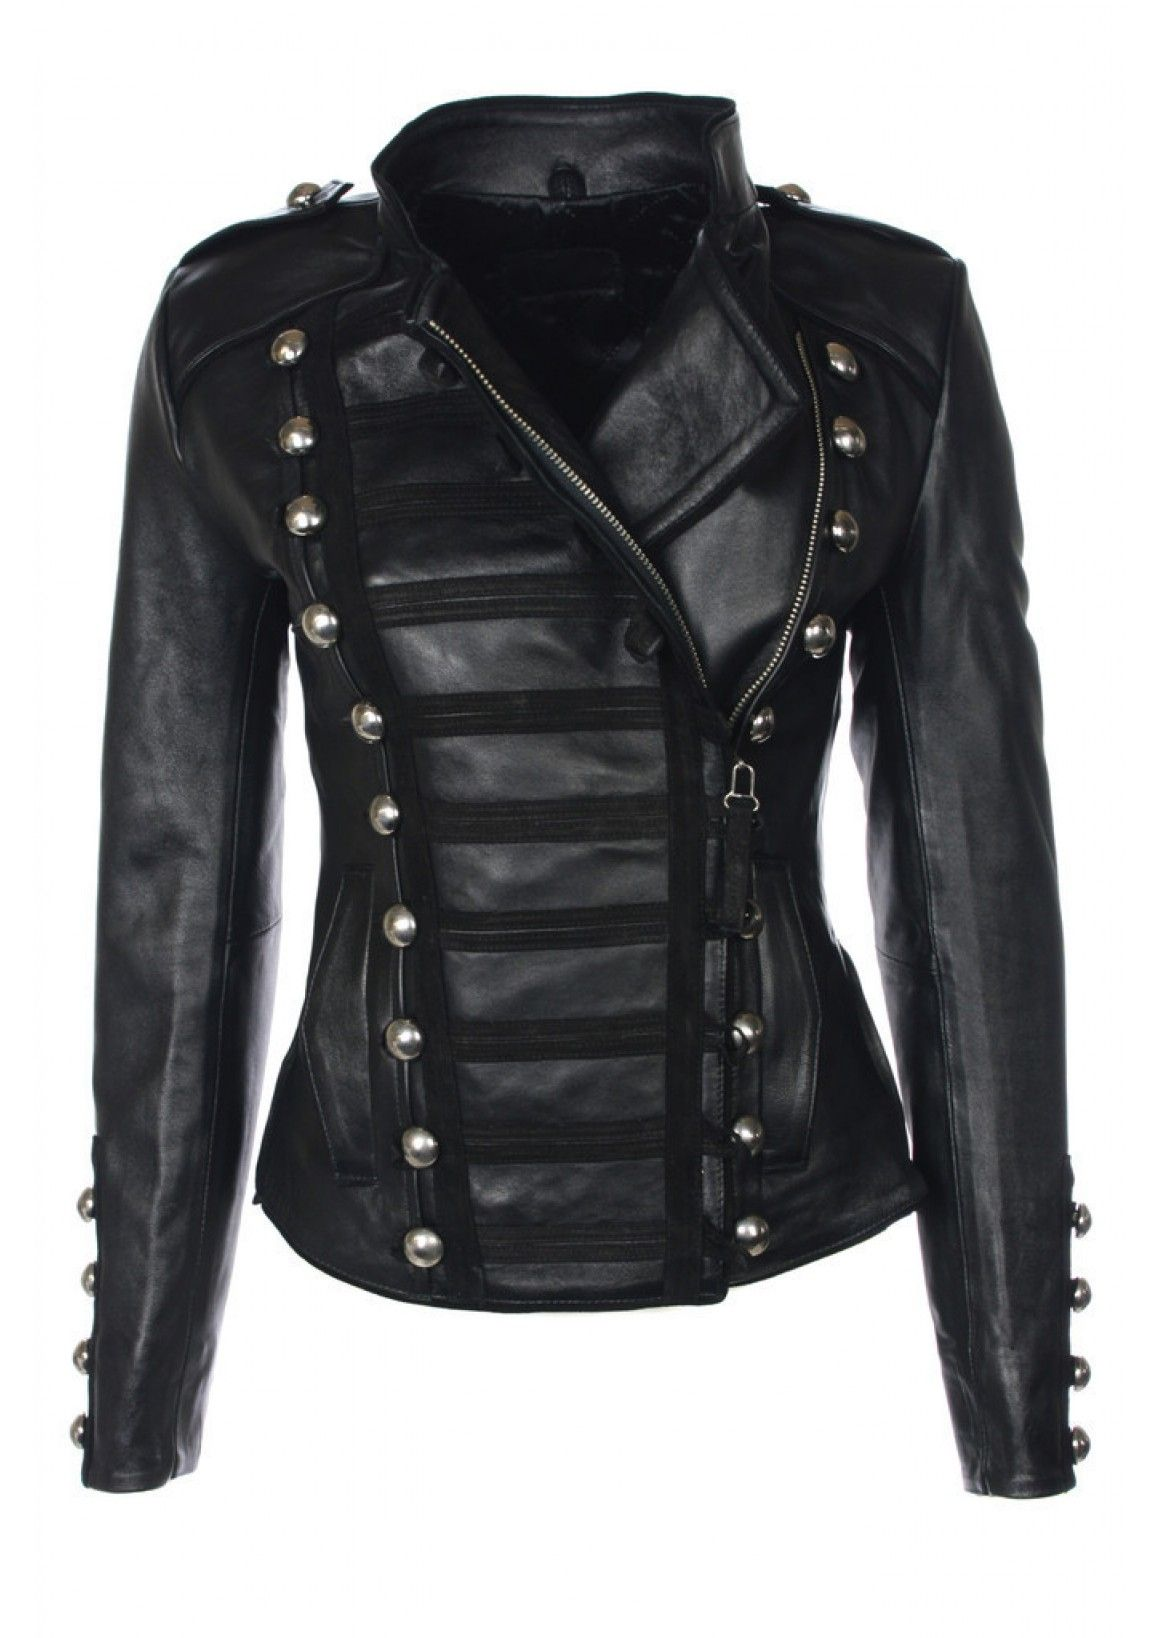 Napoleon Military Style Jackets, Military Jacket, Maxis, Faux Leather  Jackets, Military Fashion